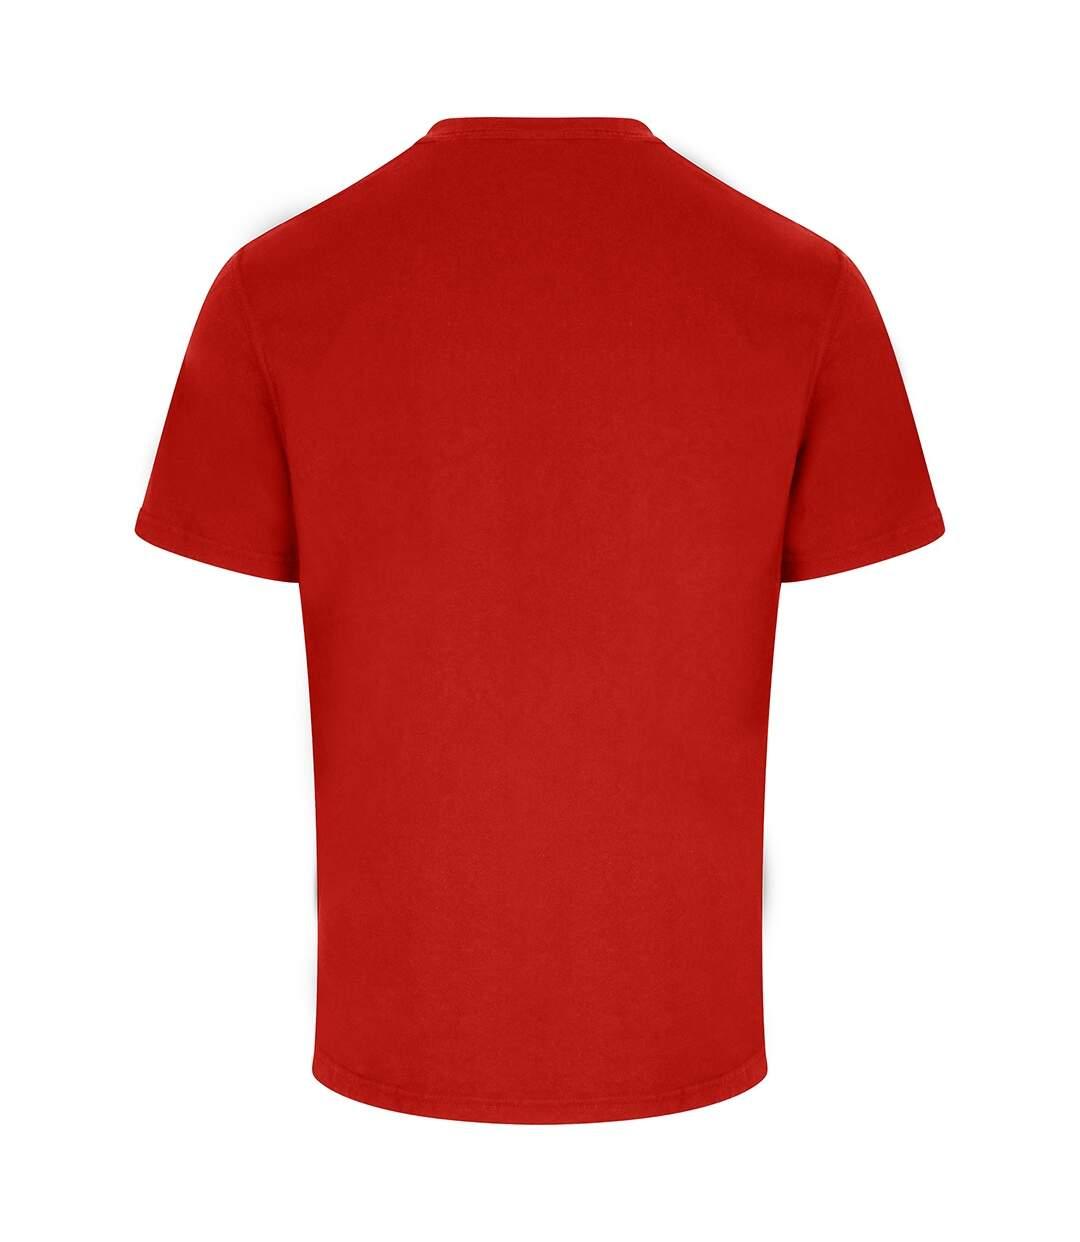 PRO RTX - T-Shirt PRO - Hommes (Rouge) - UTPC4058